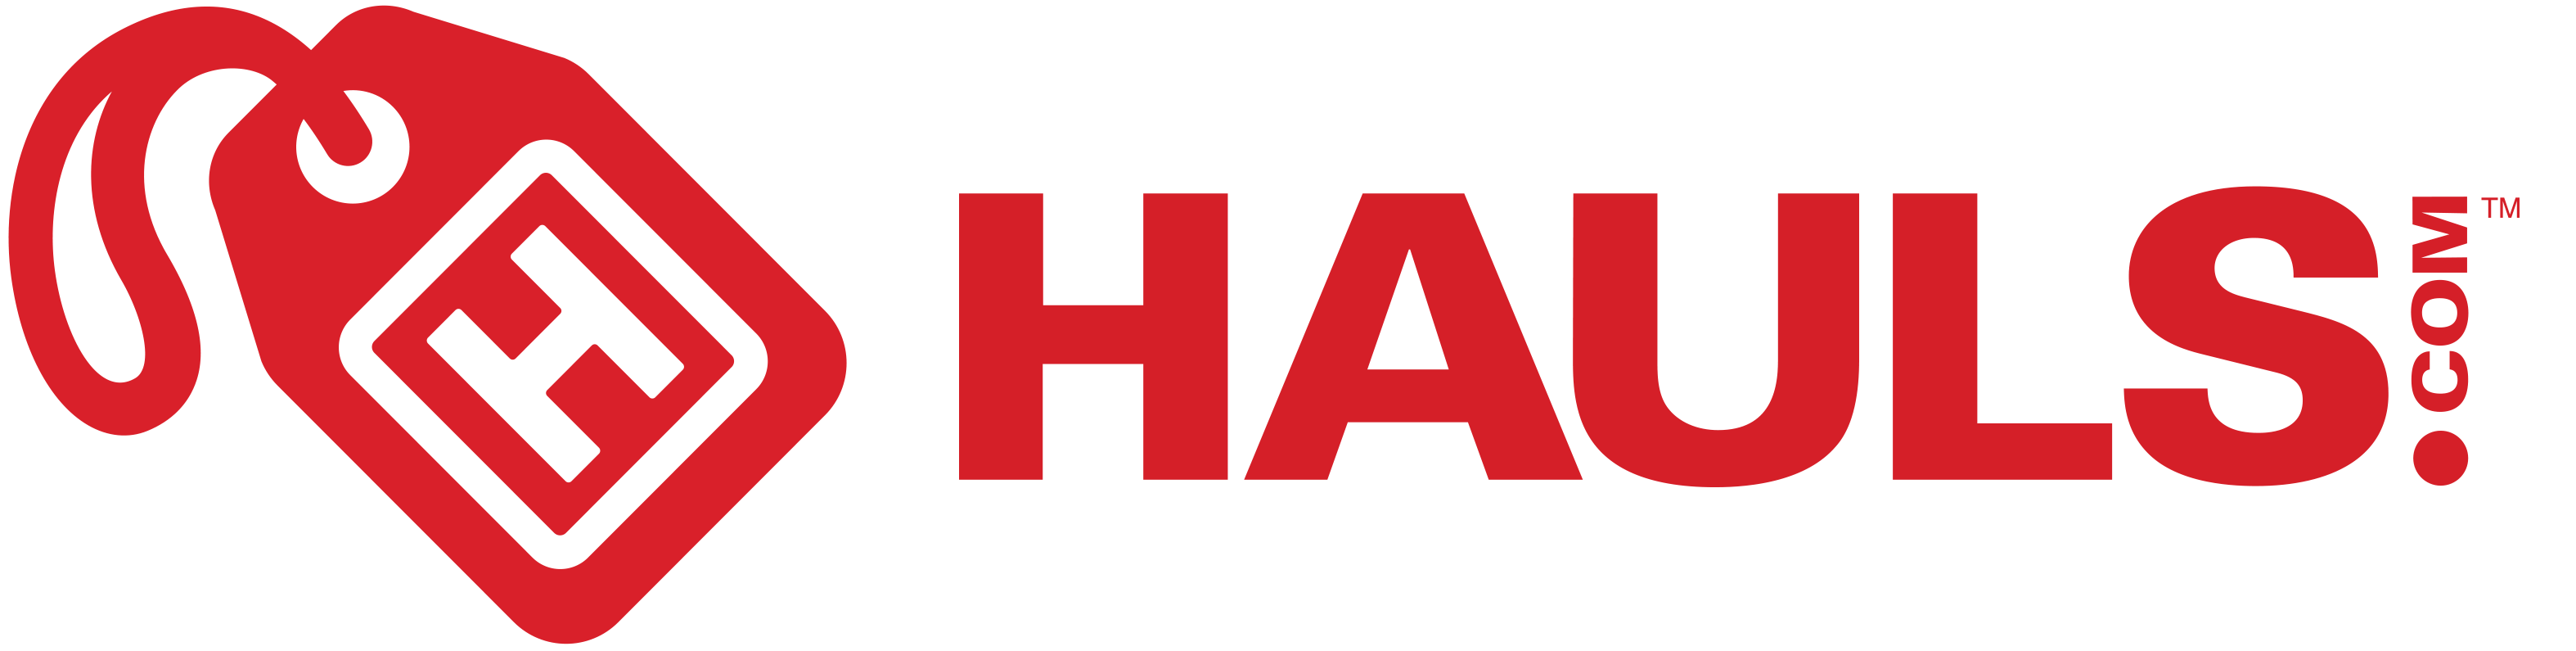 Hauls.com_logo_horizontal_v21